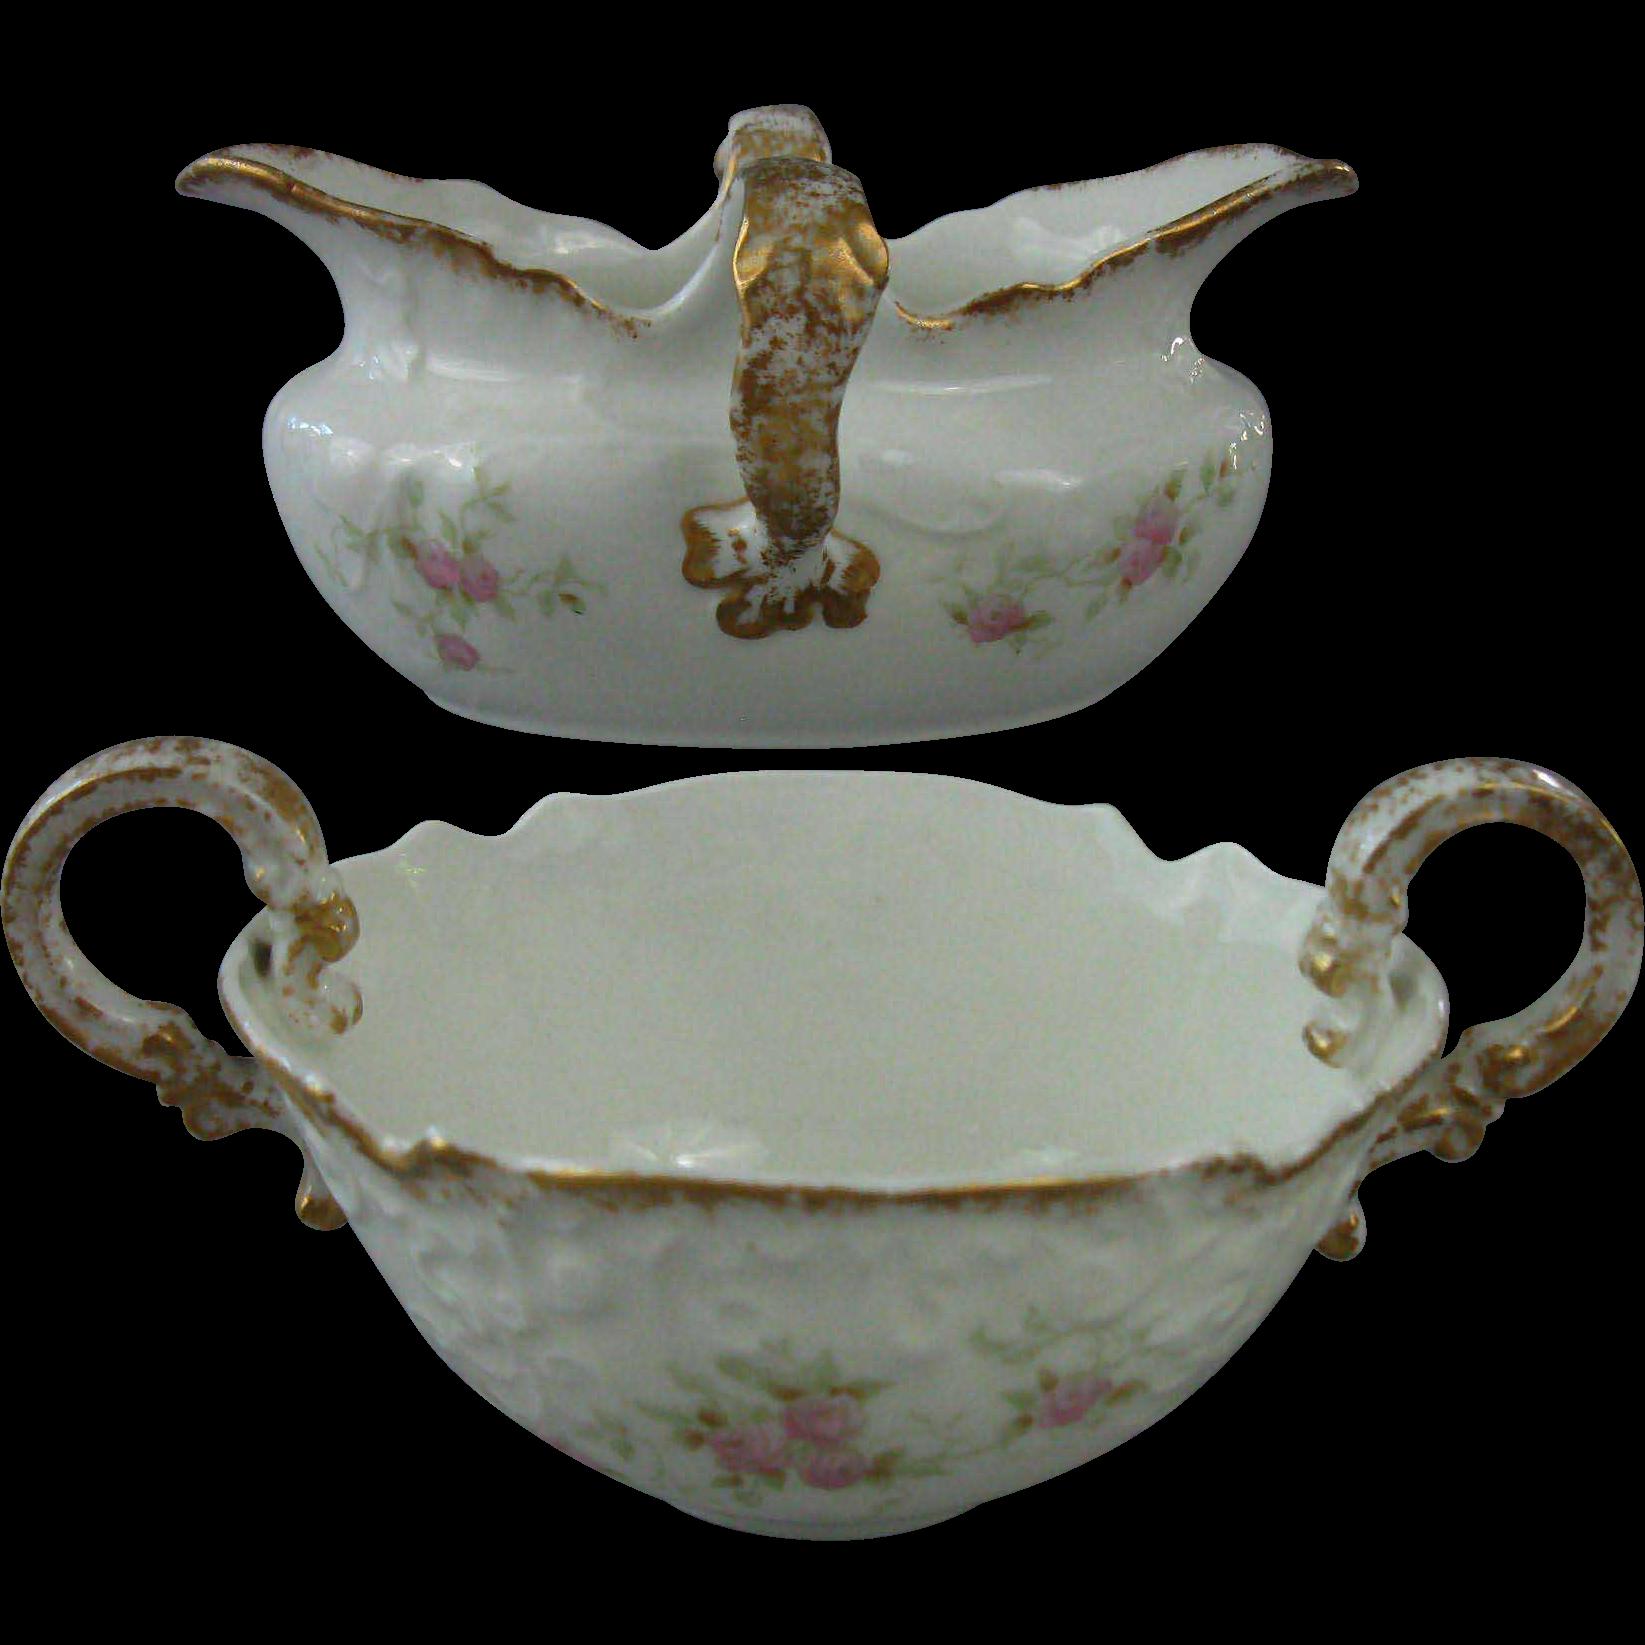 Circa 1884 Opco Syracuse China Cream Amp Sugar Set Pattern 50204 From Sweet Tea Southern